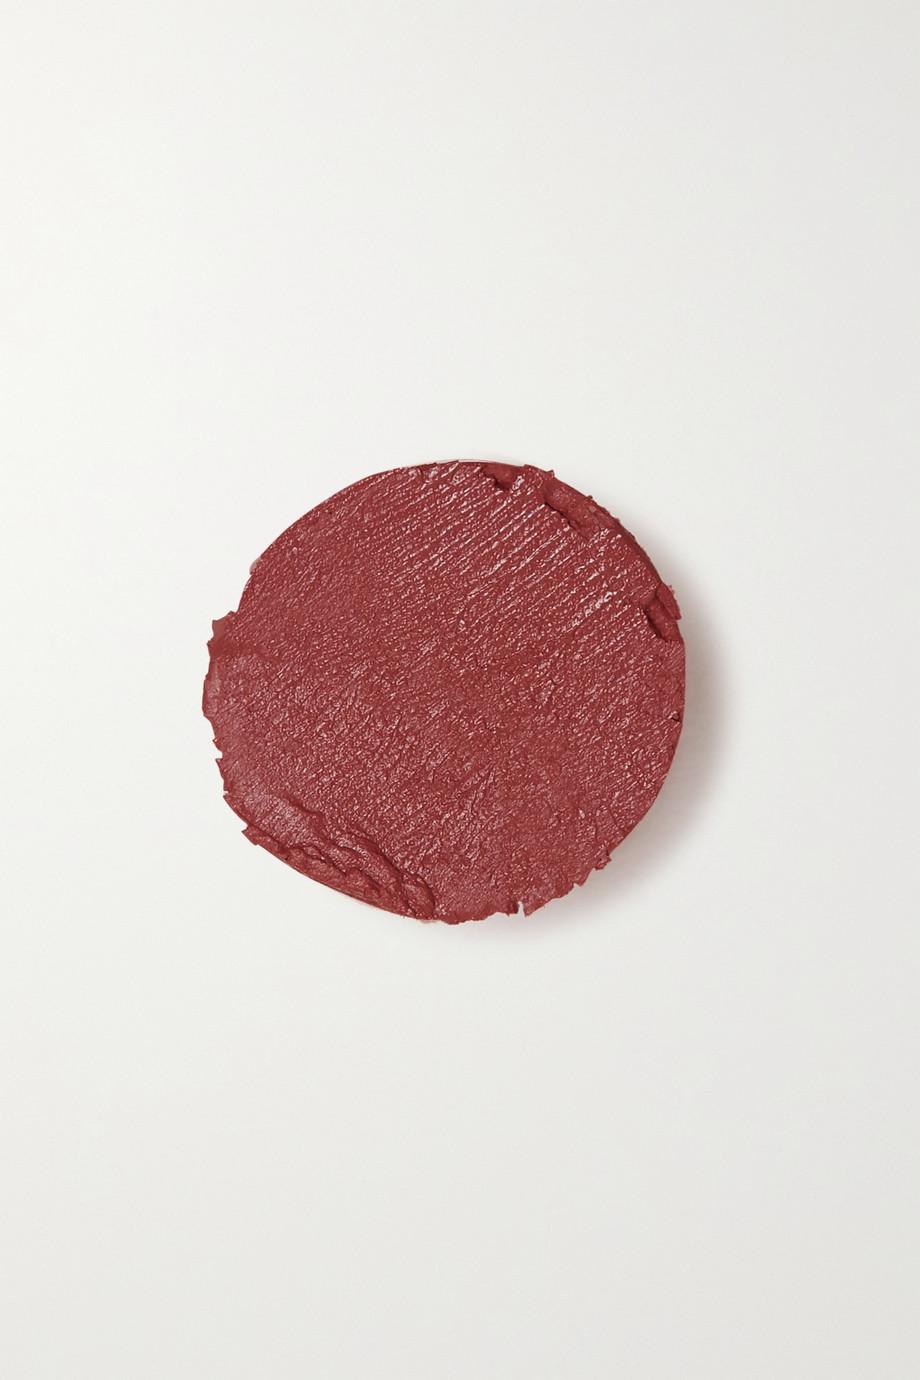 Ilia Color Block Lipstick - Rosewood